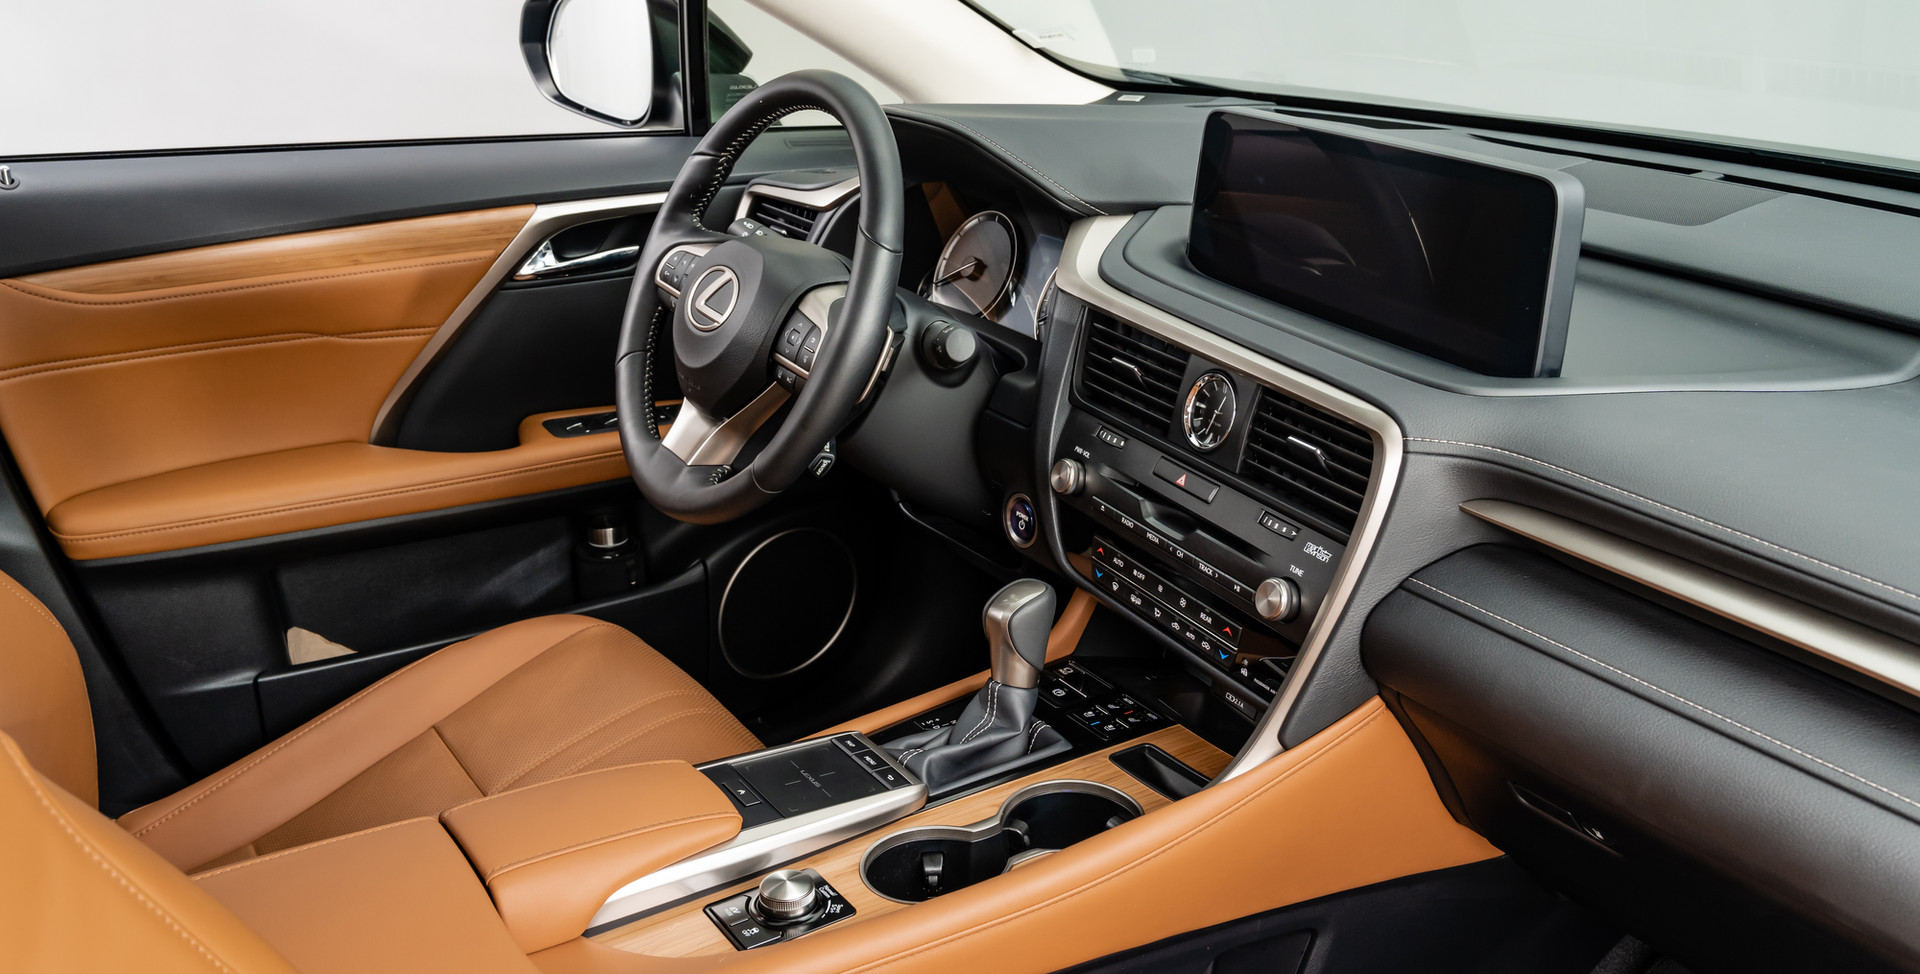 Testing - Toyota Auris03284.jpg